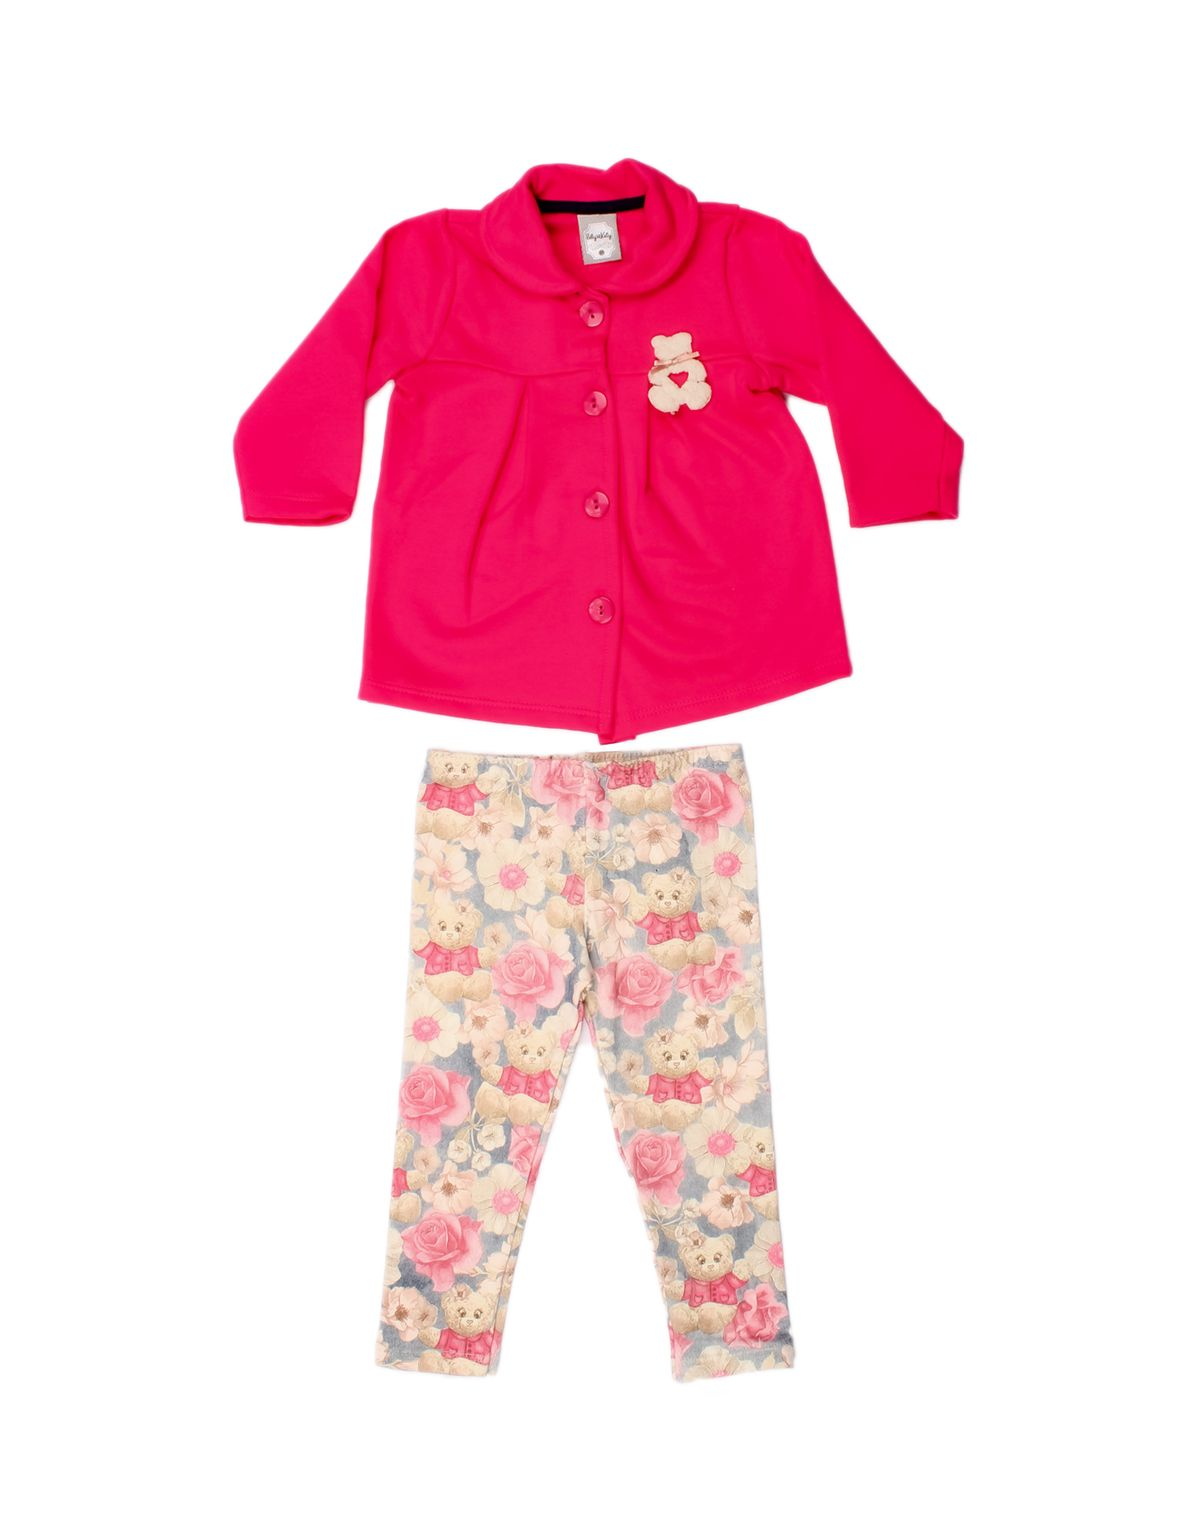 552066004-conjunto-bebe-menina-manga-longa-estampa-urso-pink-1-a81